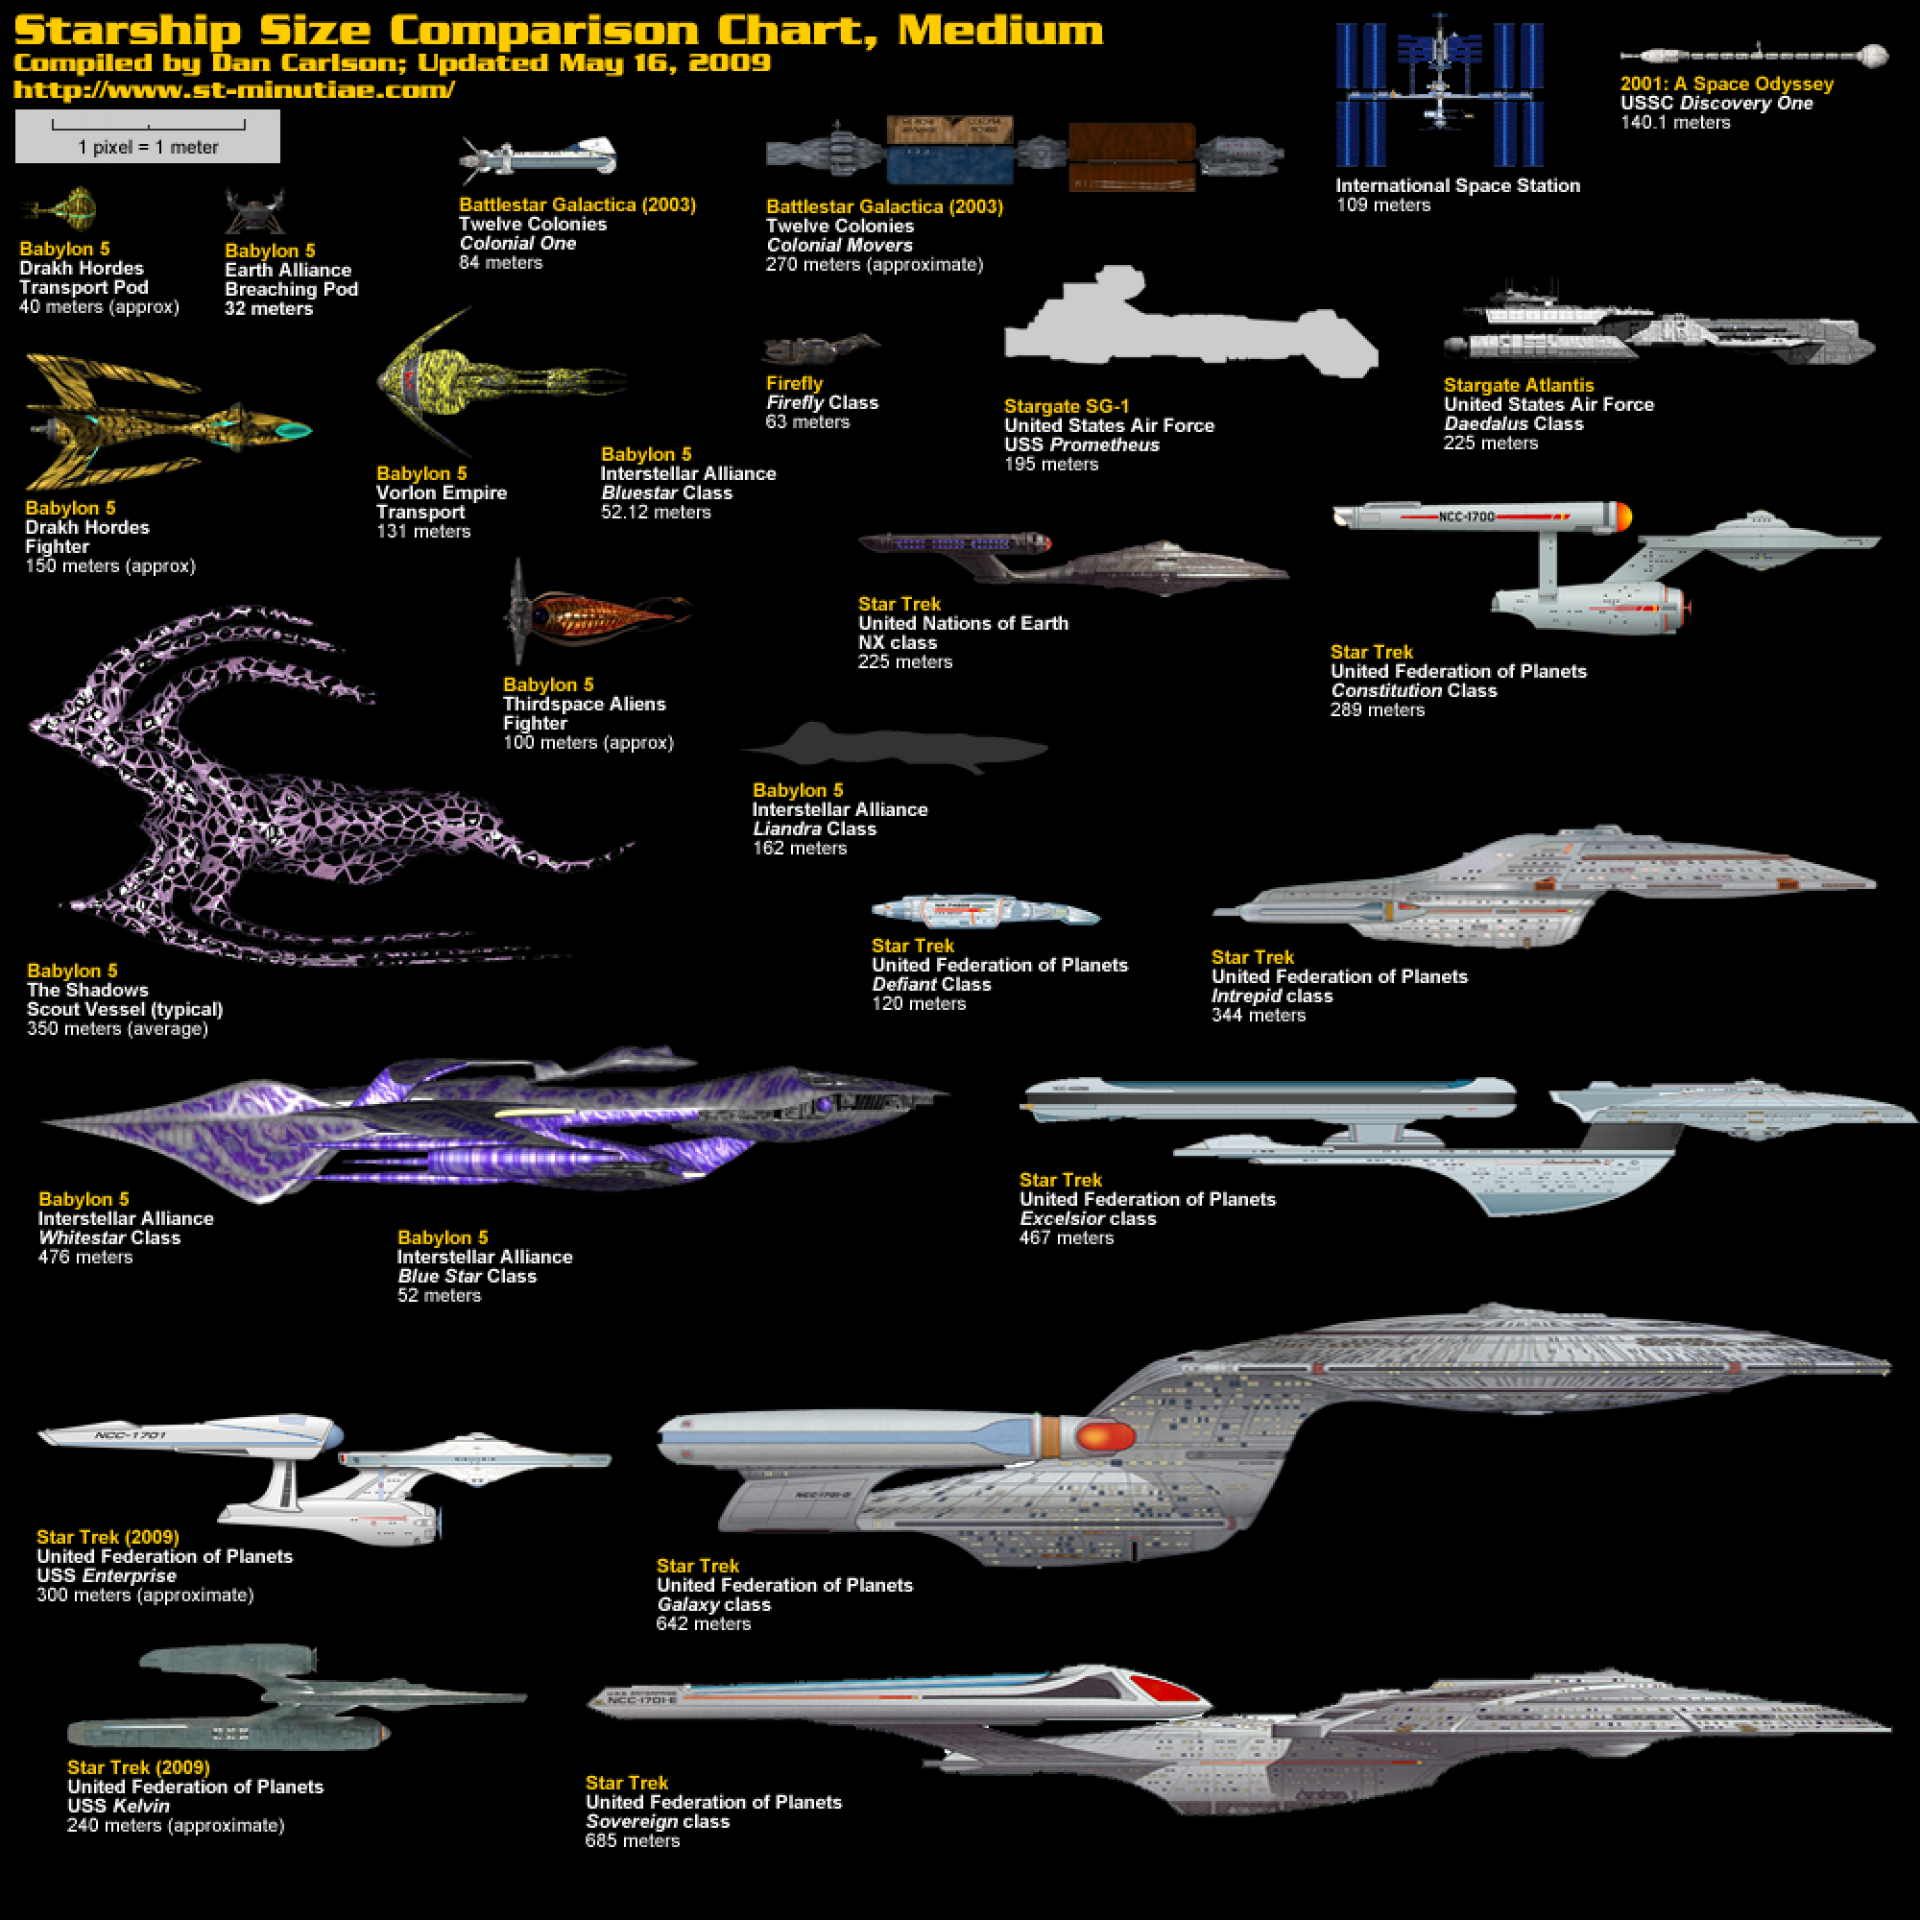 Star ship size comparison charts http://static.comicvine.com/uploads ...